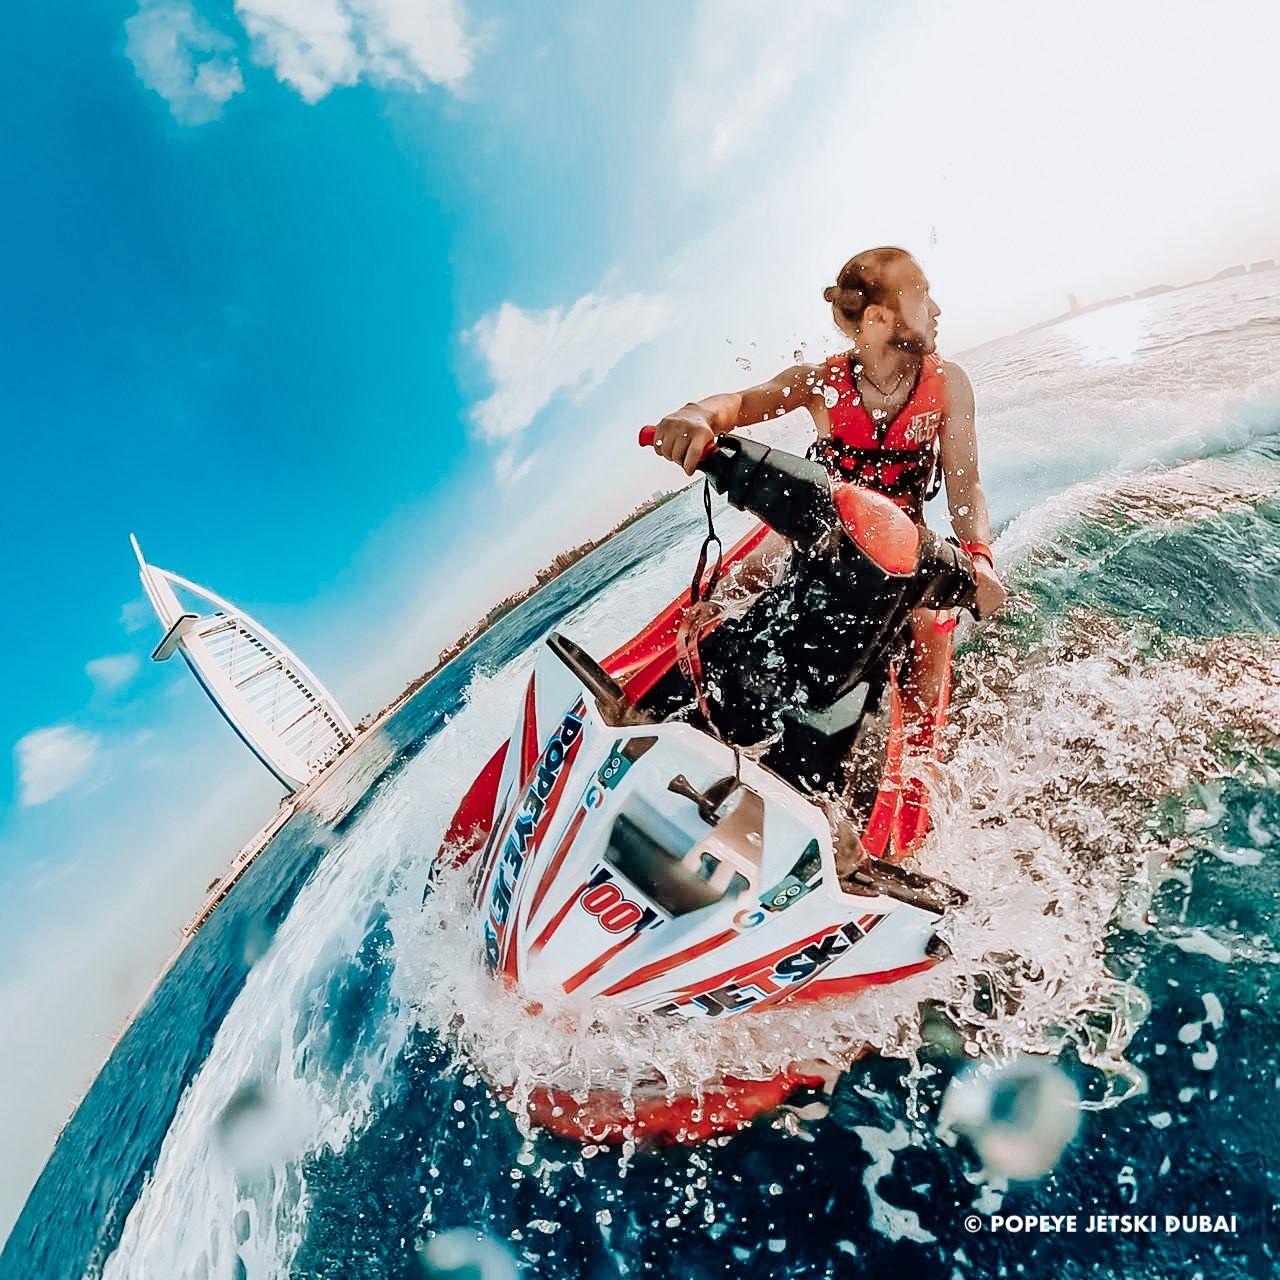 Jet ski rental dubai popeye jetskijetski with images